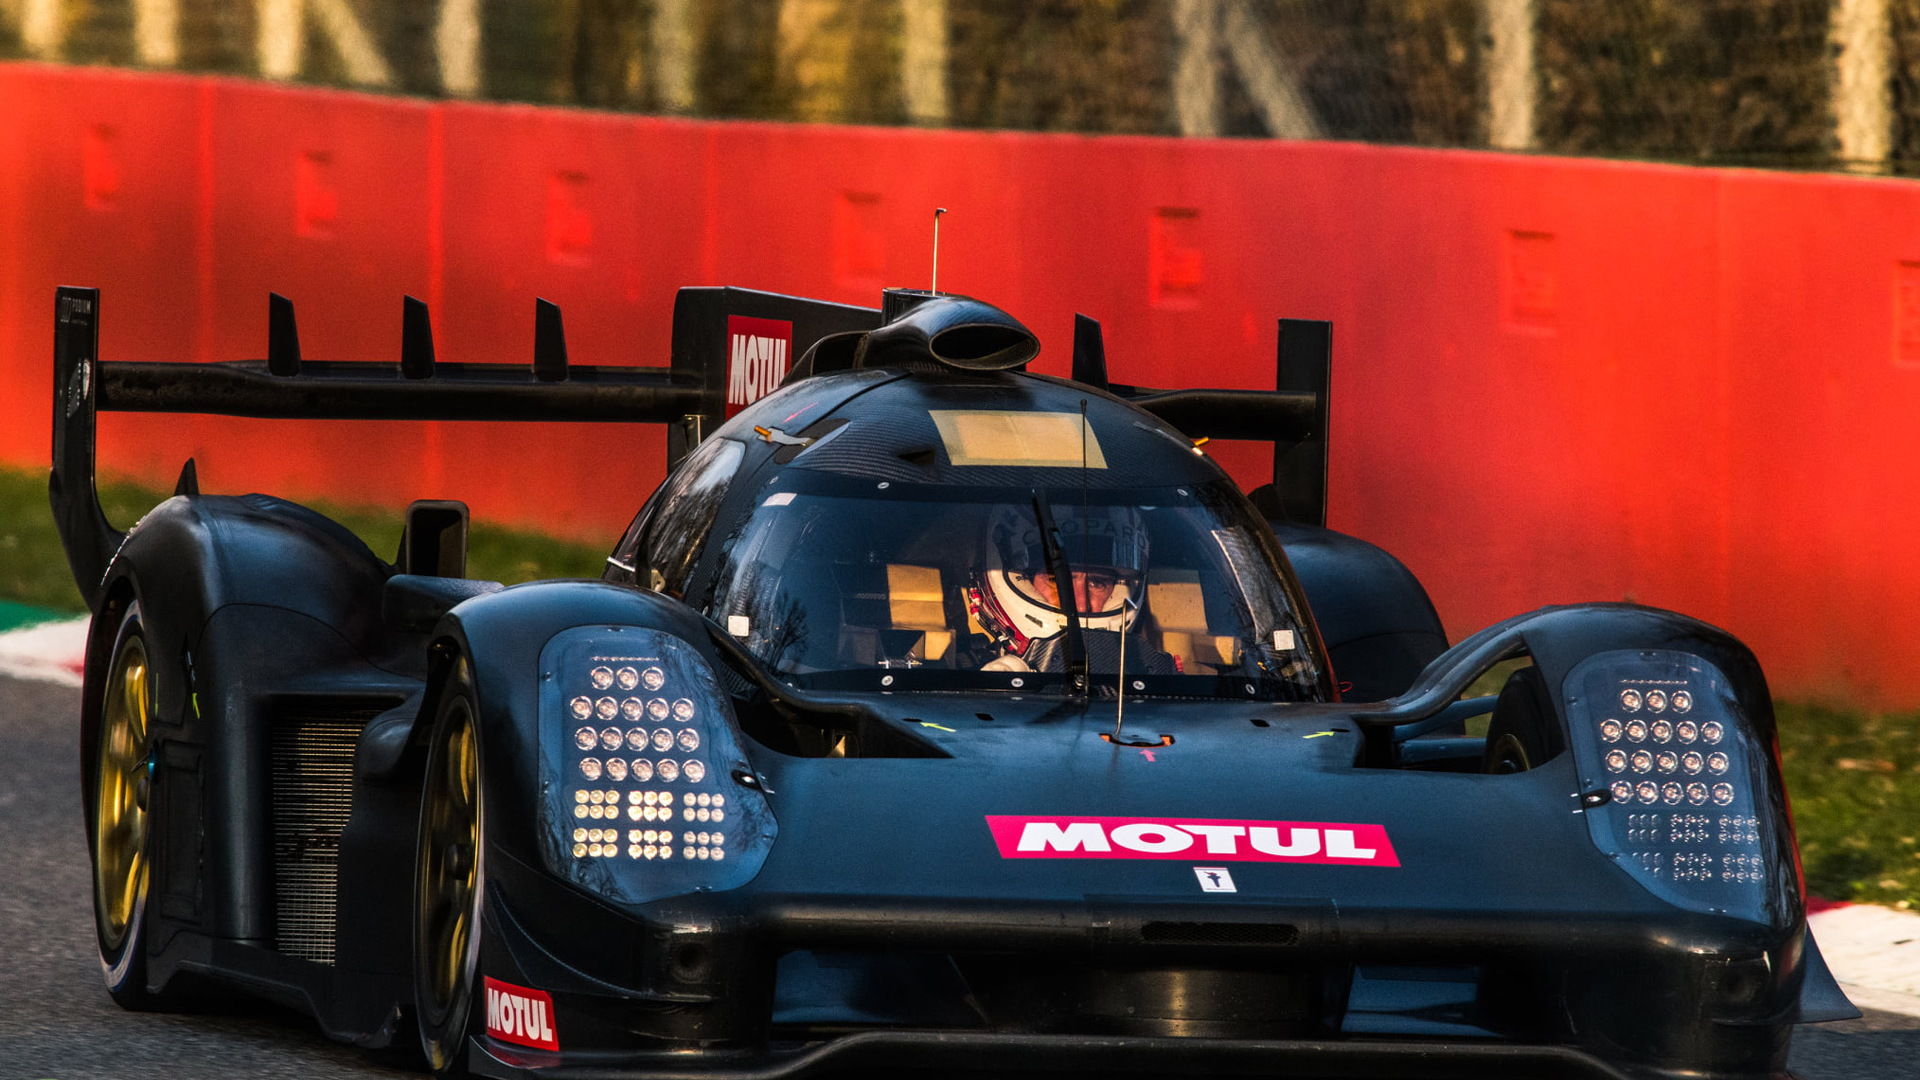 Scuderia Cameron Glickenhaus 007 Le Mans Hypercar race car - Photo credit: Fabrizio Balboni